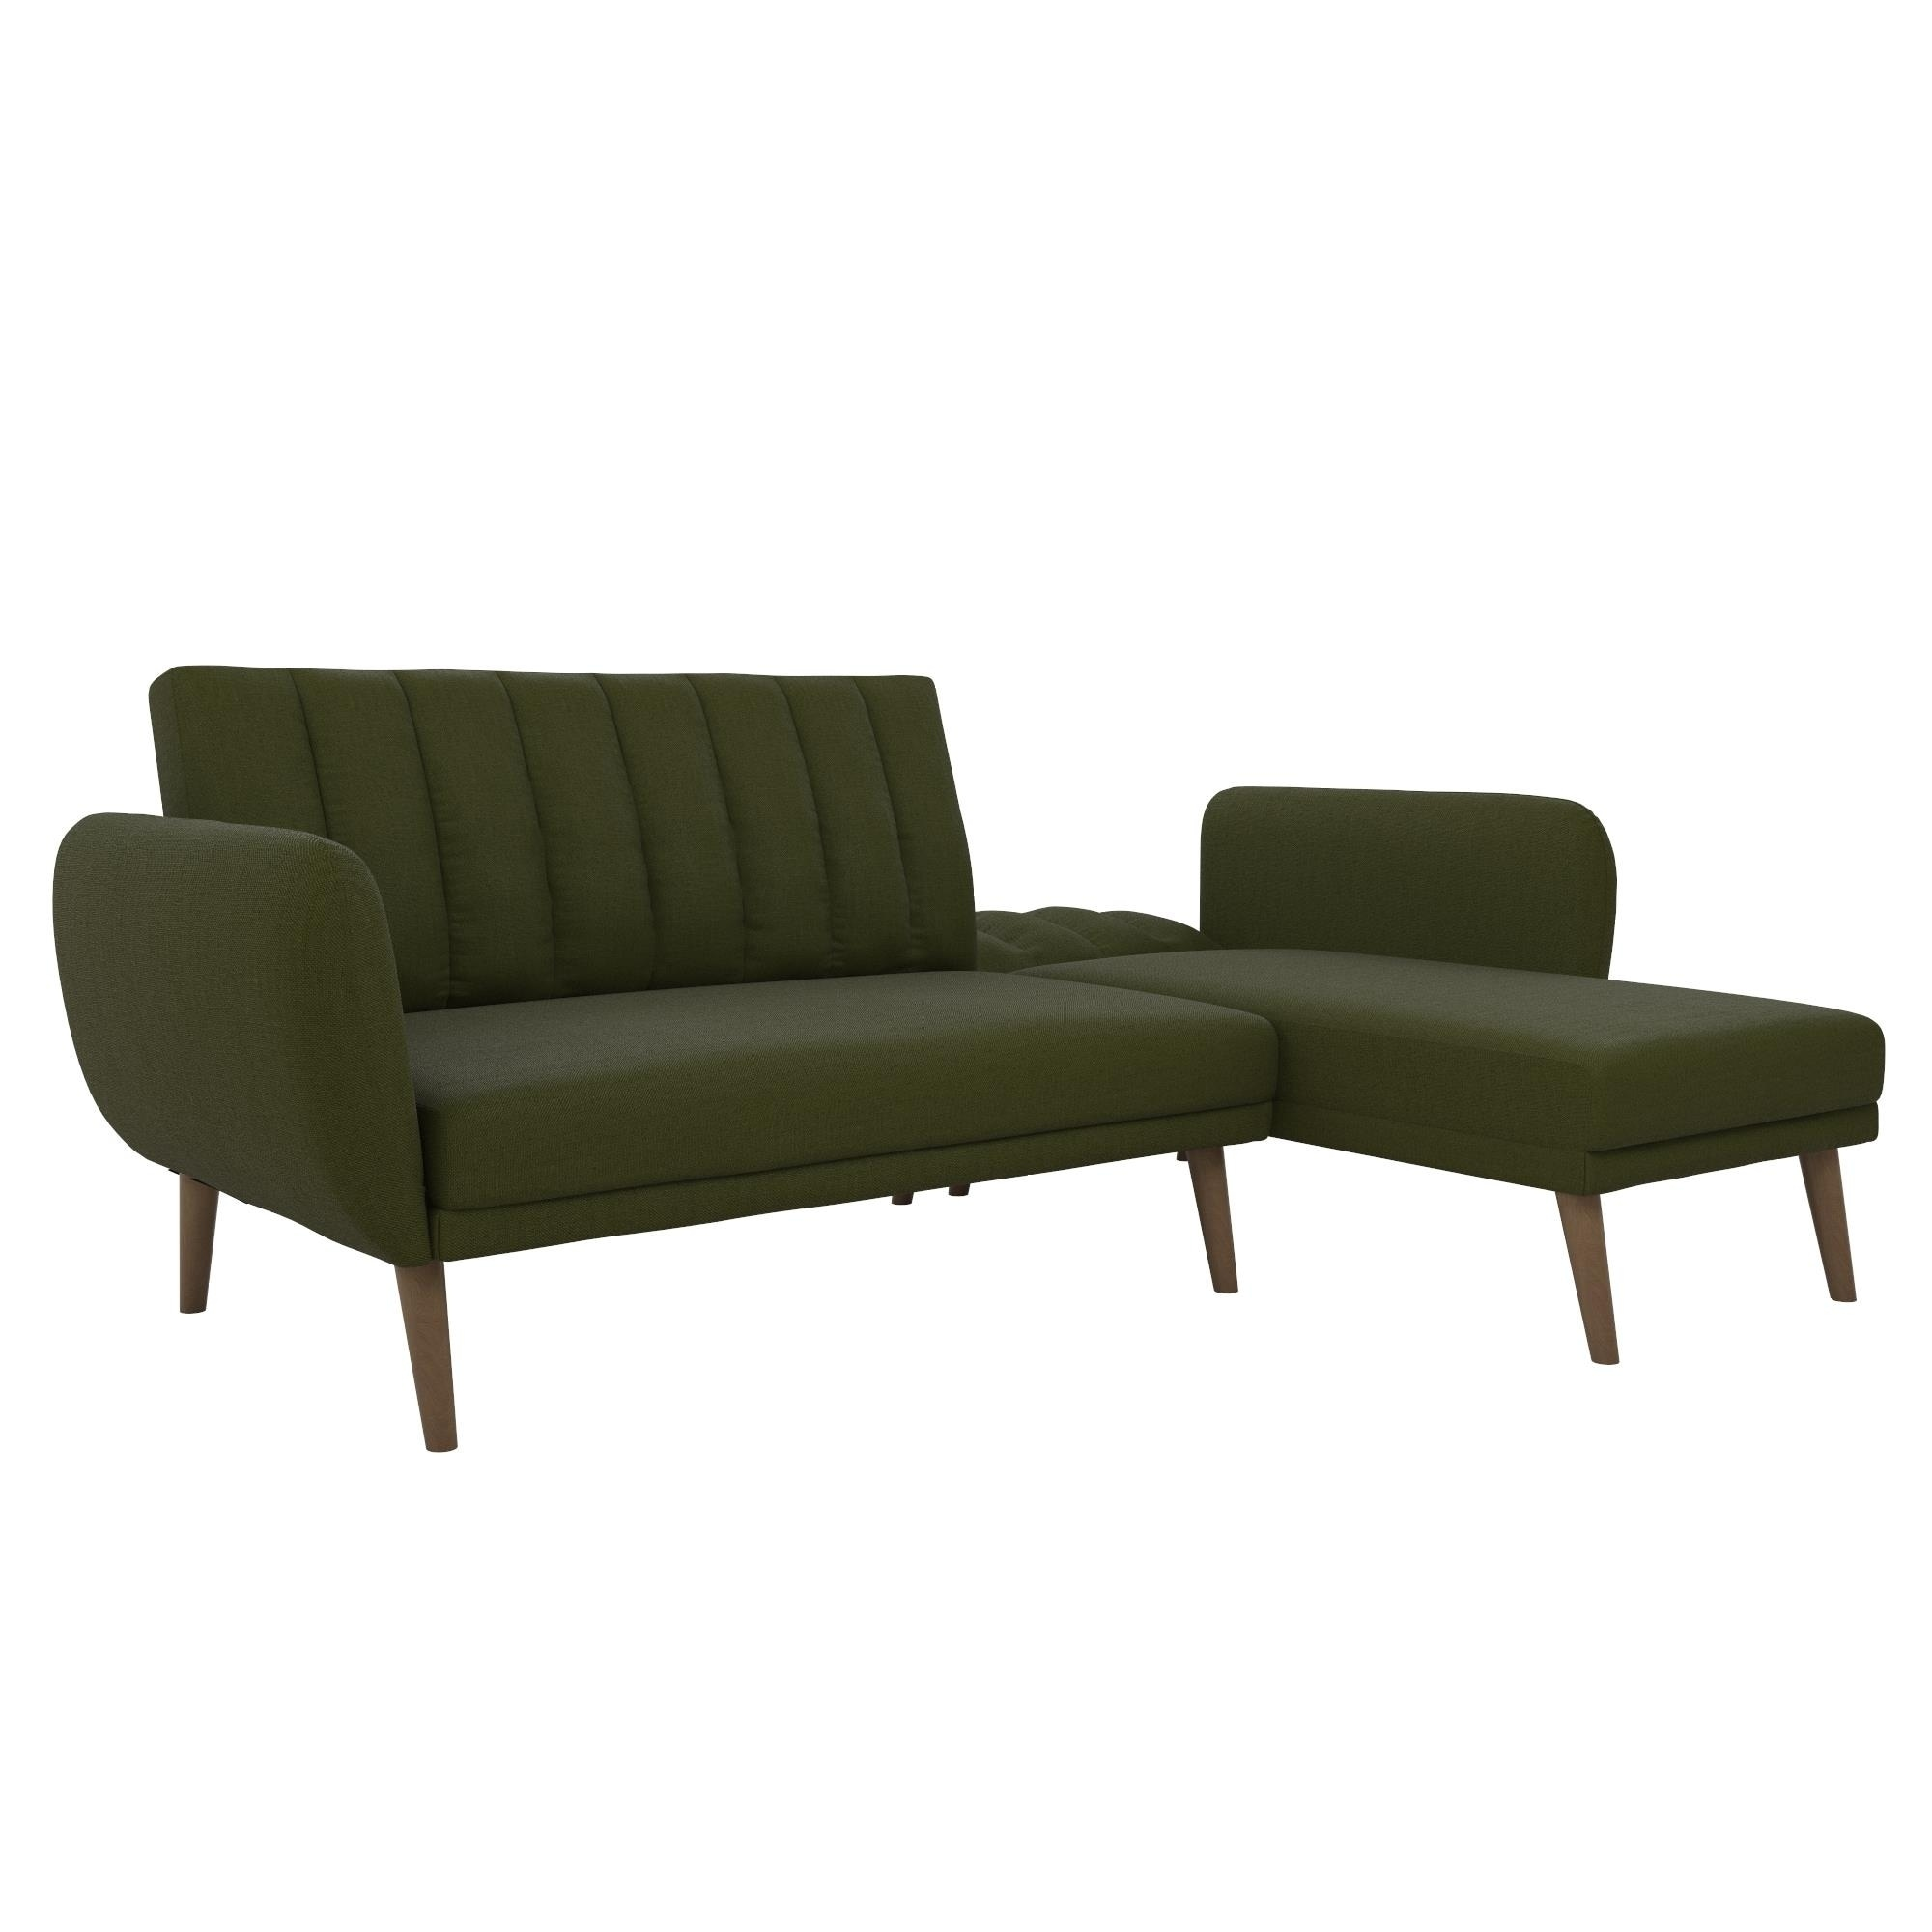 buy popular 4f654 068c6 Novogratz Brittany Sectional Futon Sofa